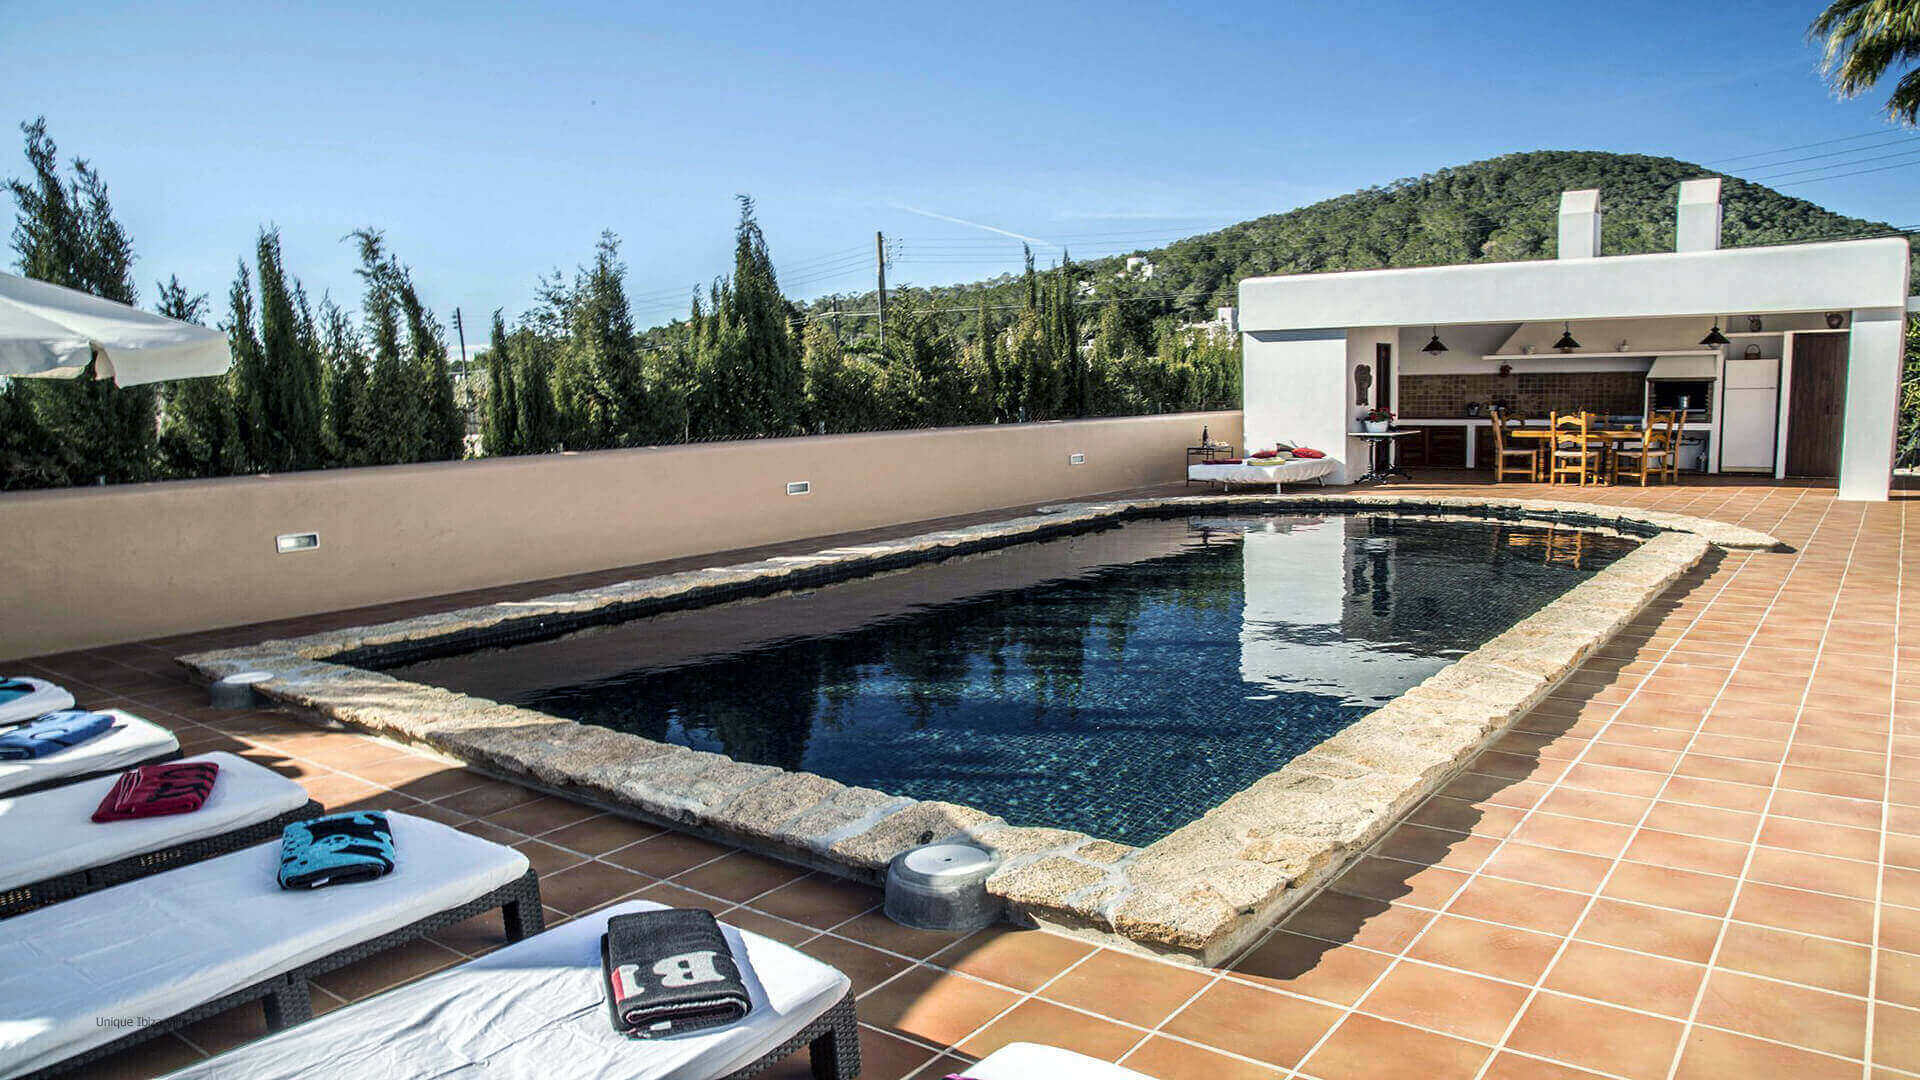 Villa Andrea Ibiza 4 KM4 Near Ibiza Town